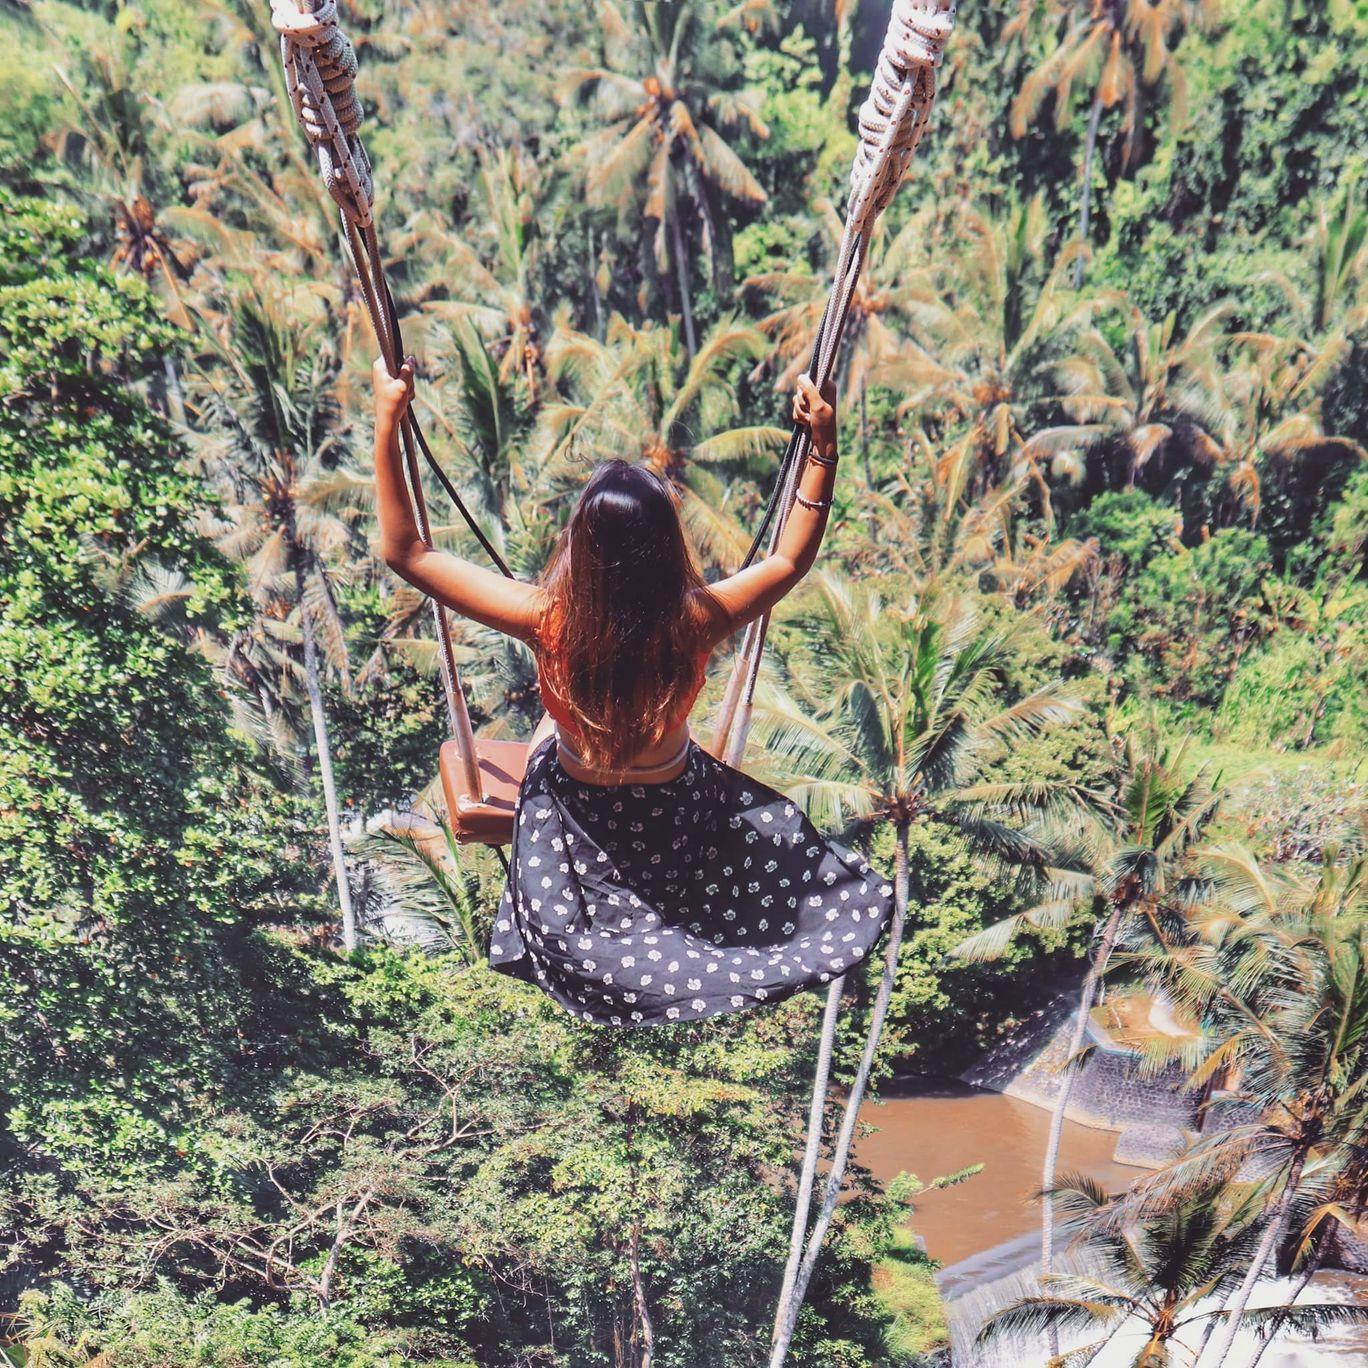 Photo of Bali Swing By Verma Ekta